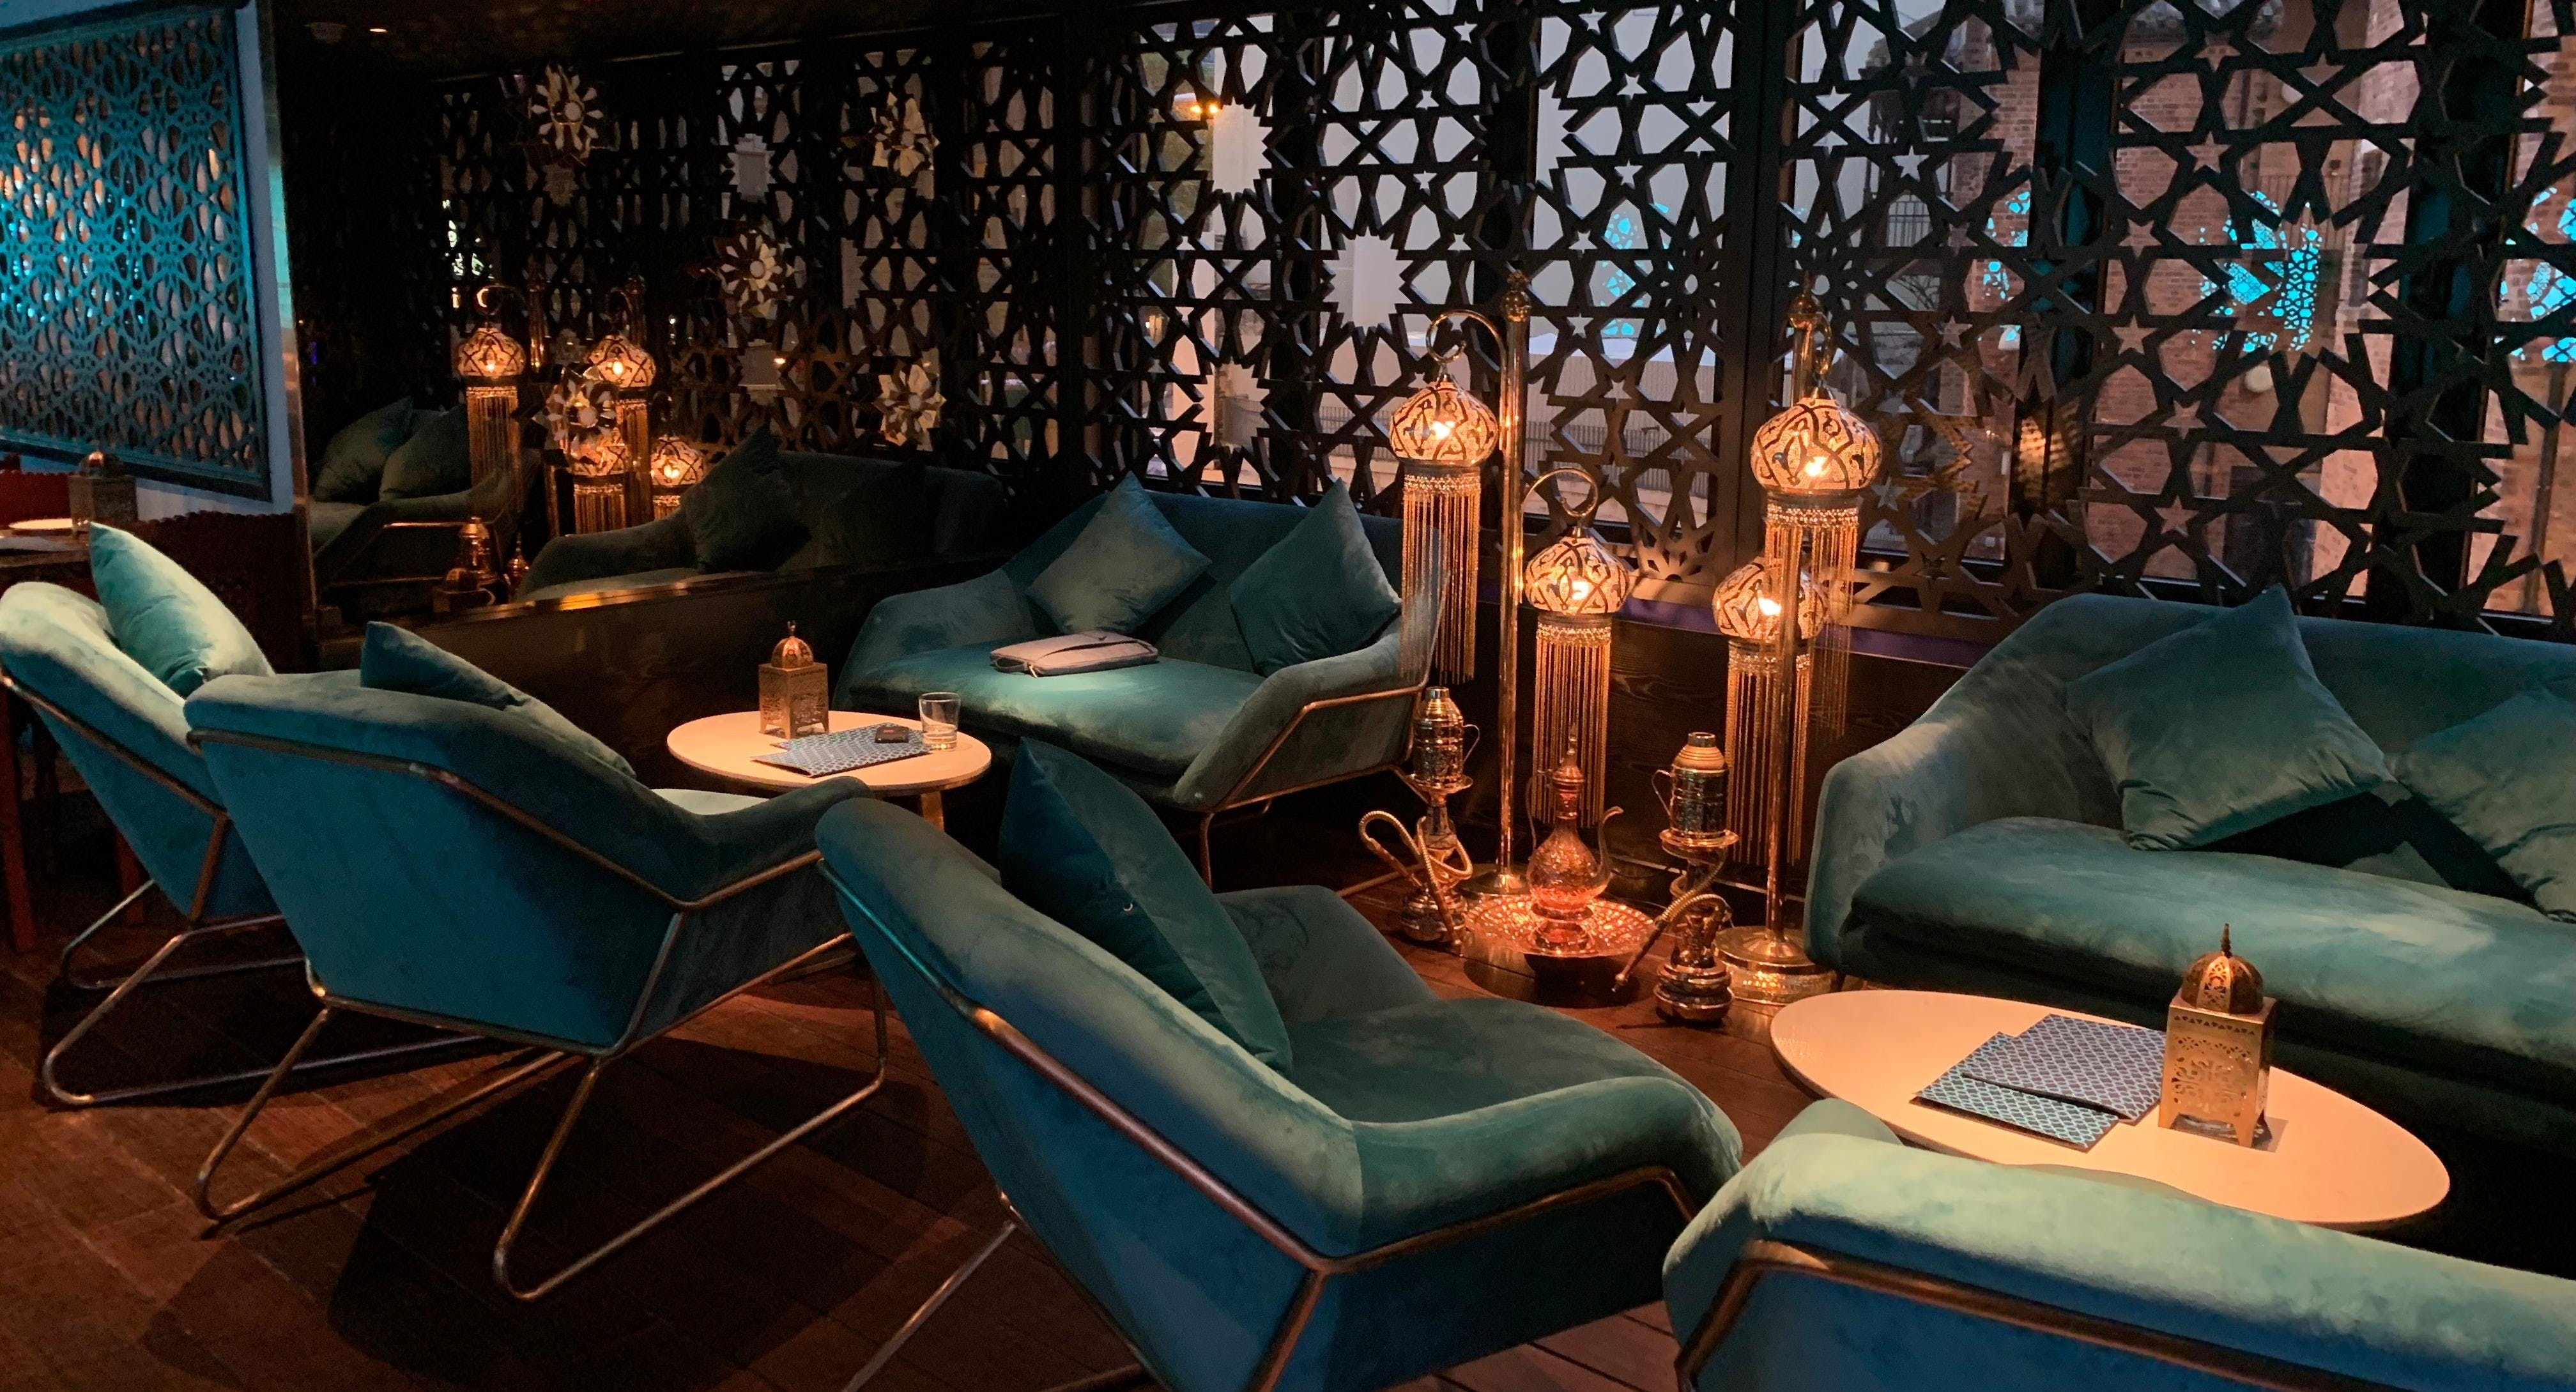 Shahrazad Lebanese Dining Lounge & Bar Hong Kong image 2